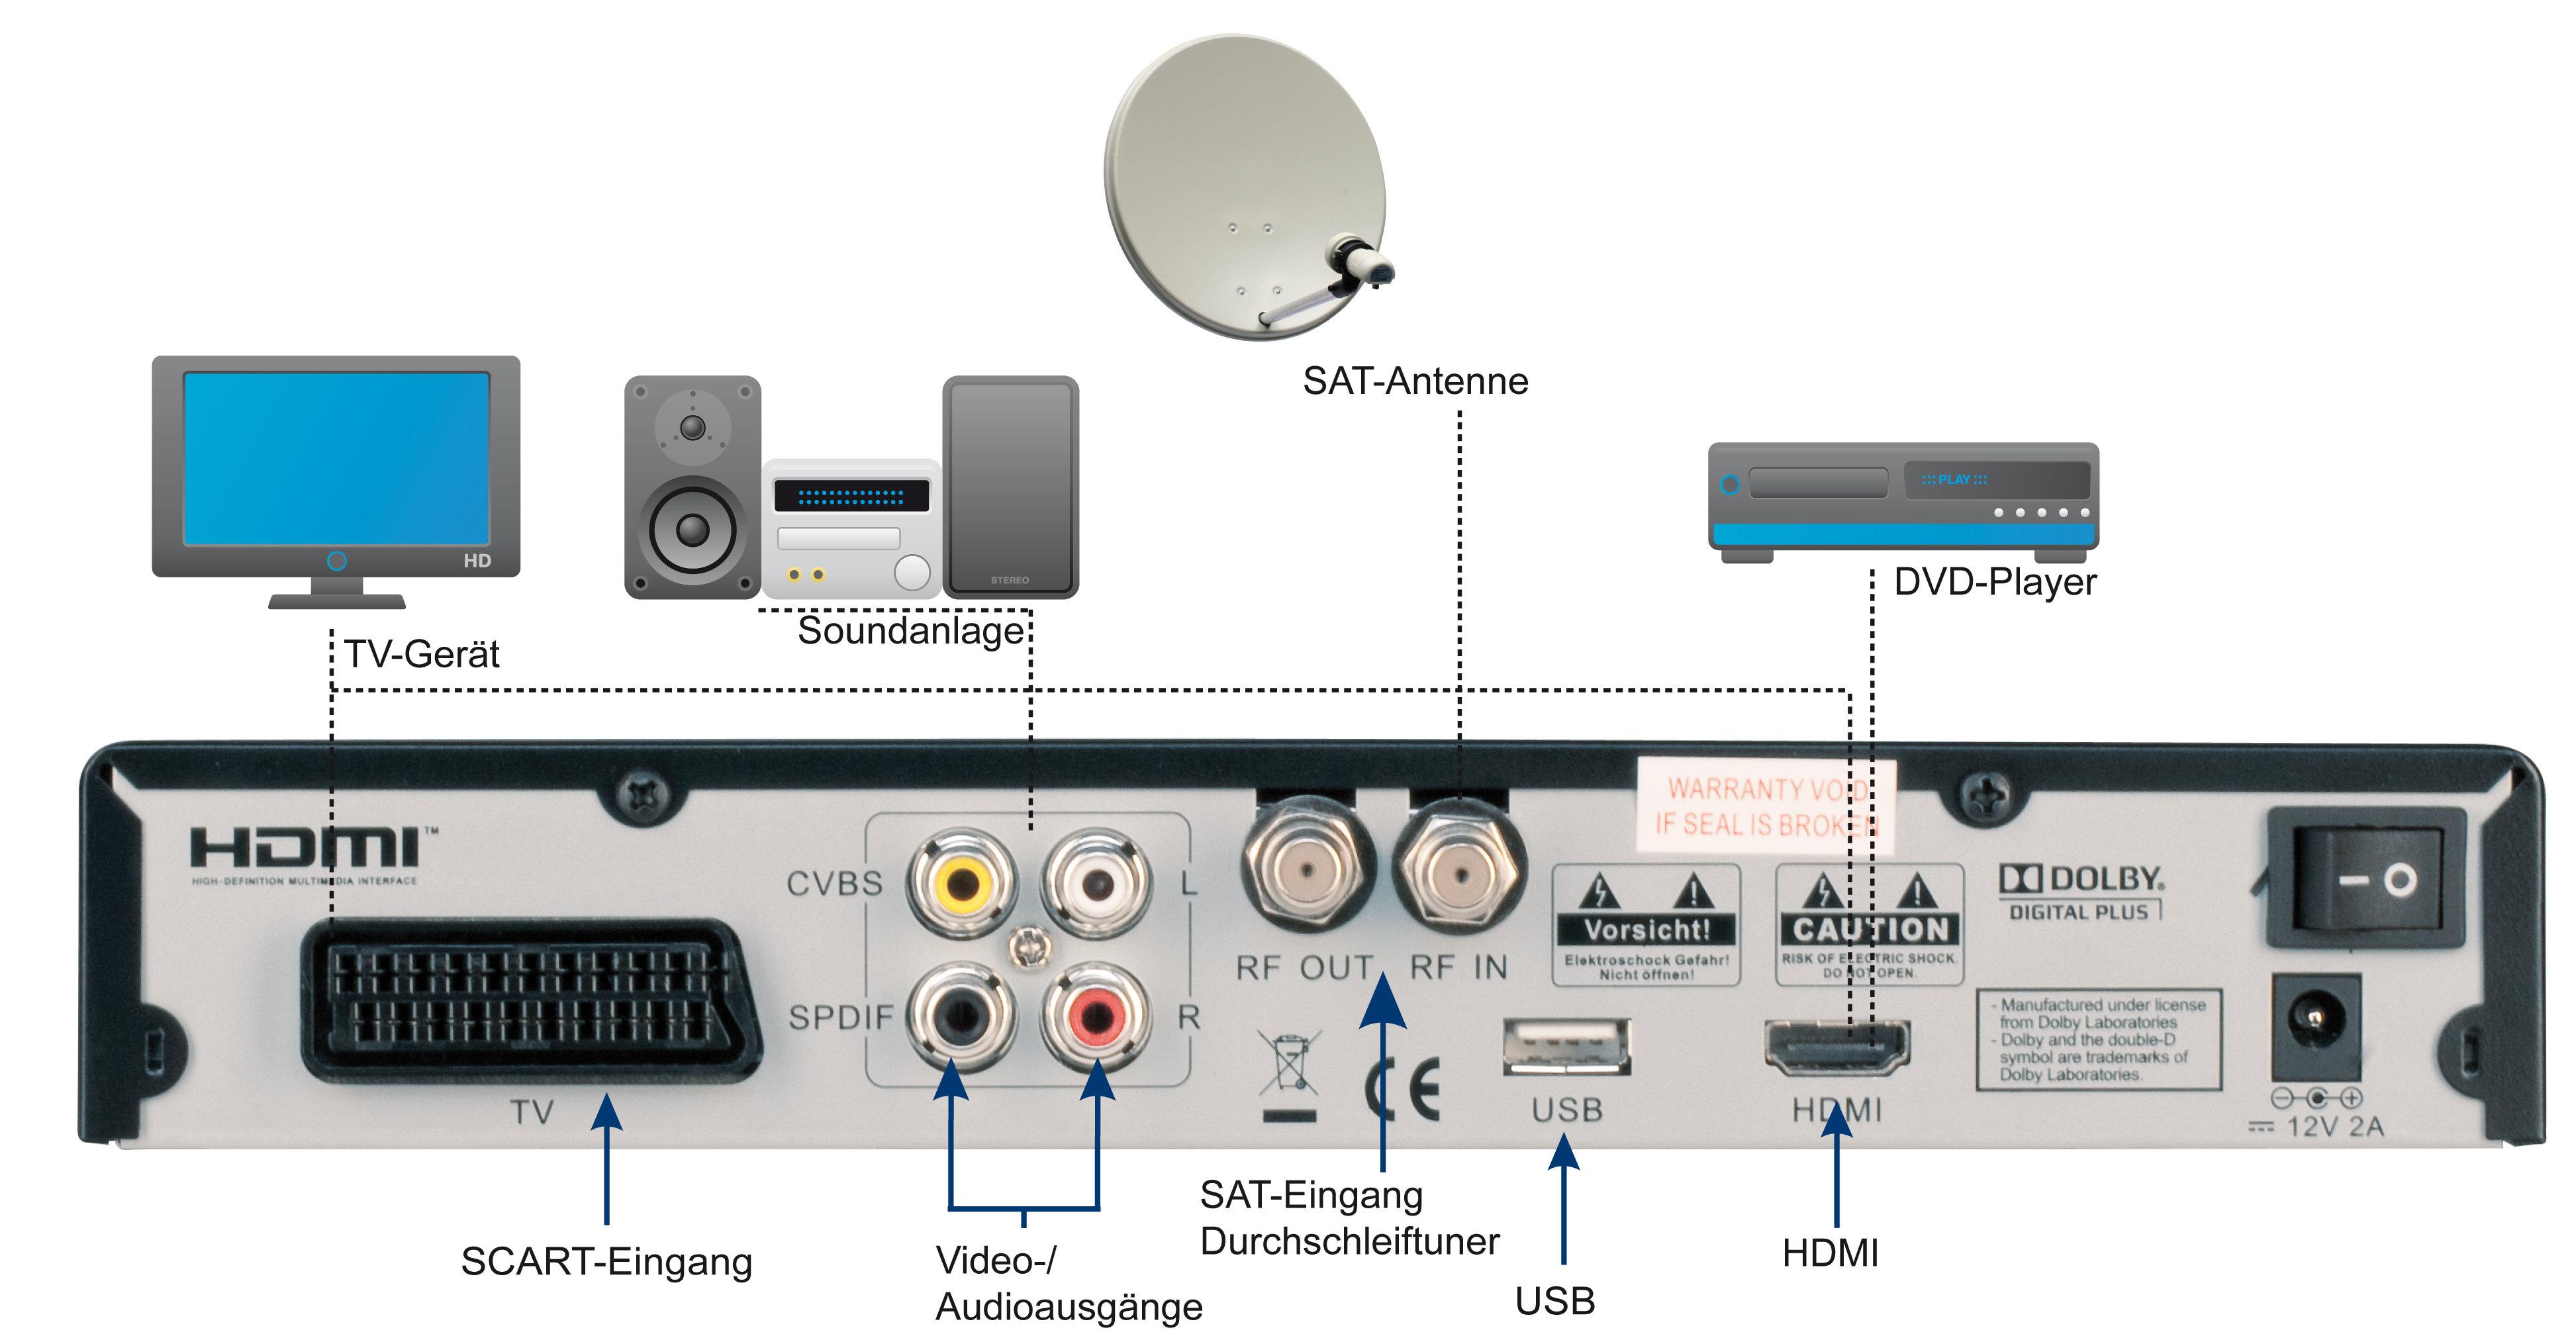 telestar digio 20 hd digitaler hd satelliten receiver. Black Bedroom Furniture Sets. Home Design Ideas